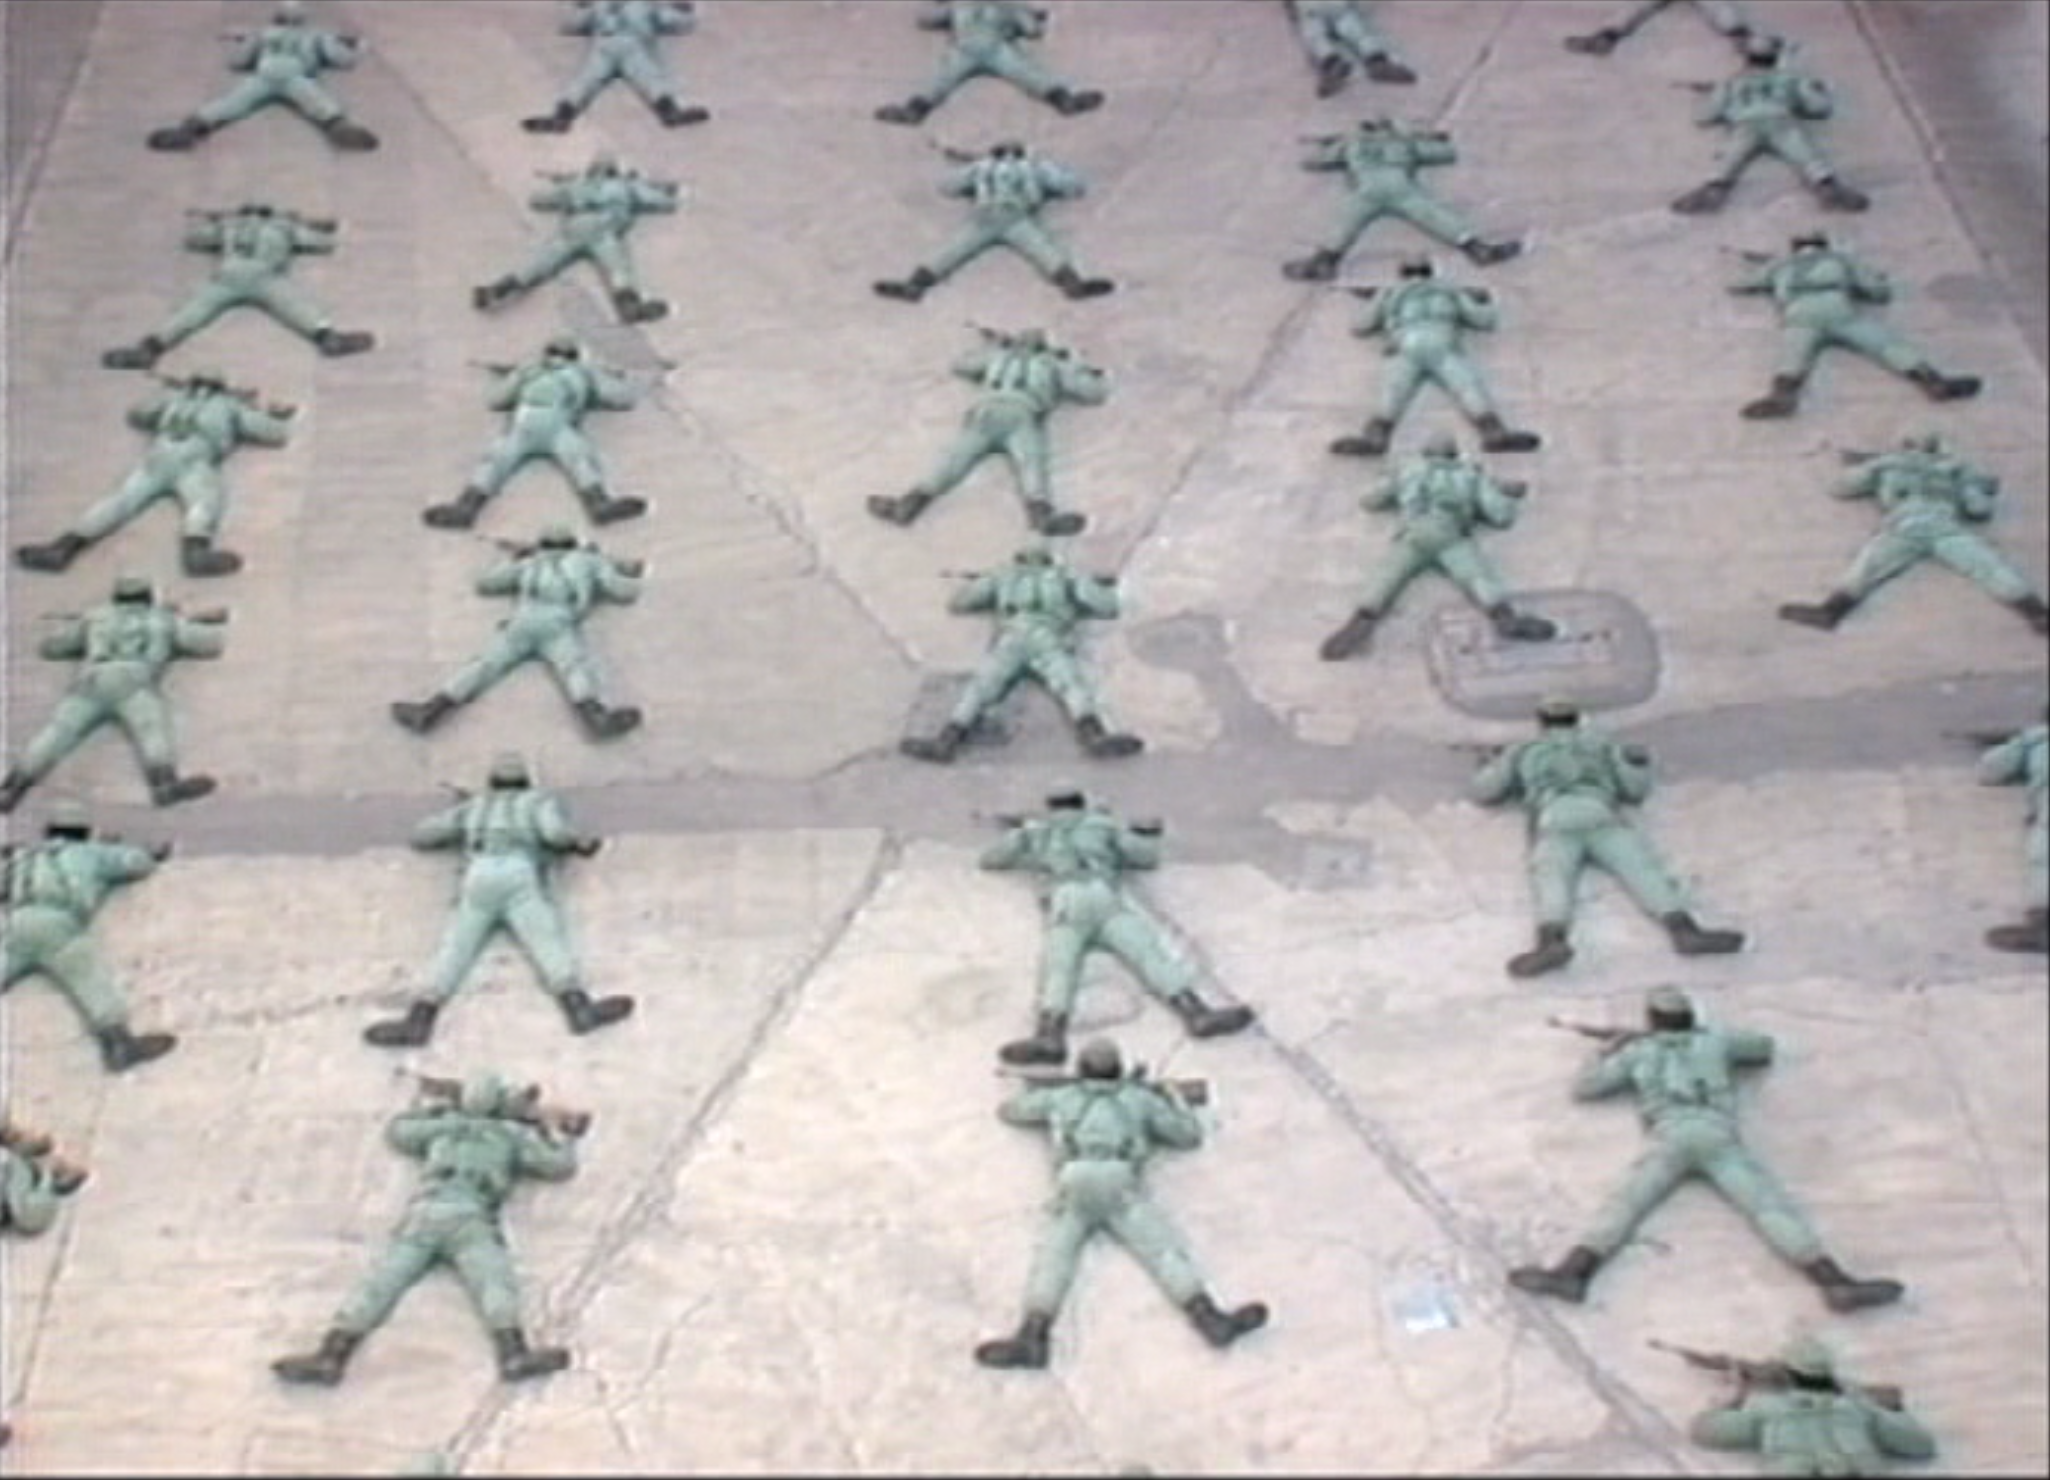 Sábado legionario  (Javier Codesal, 1988)